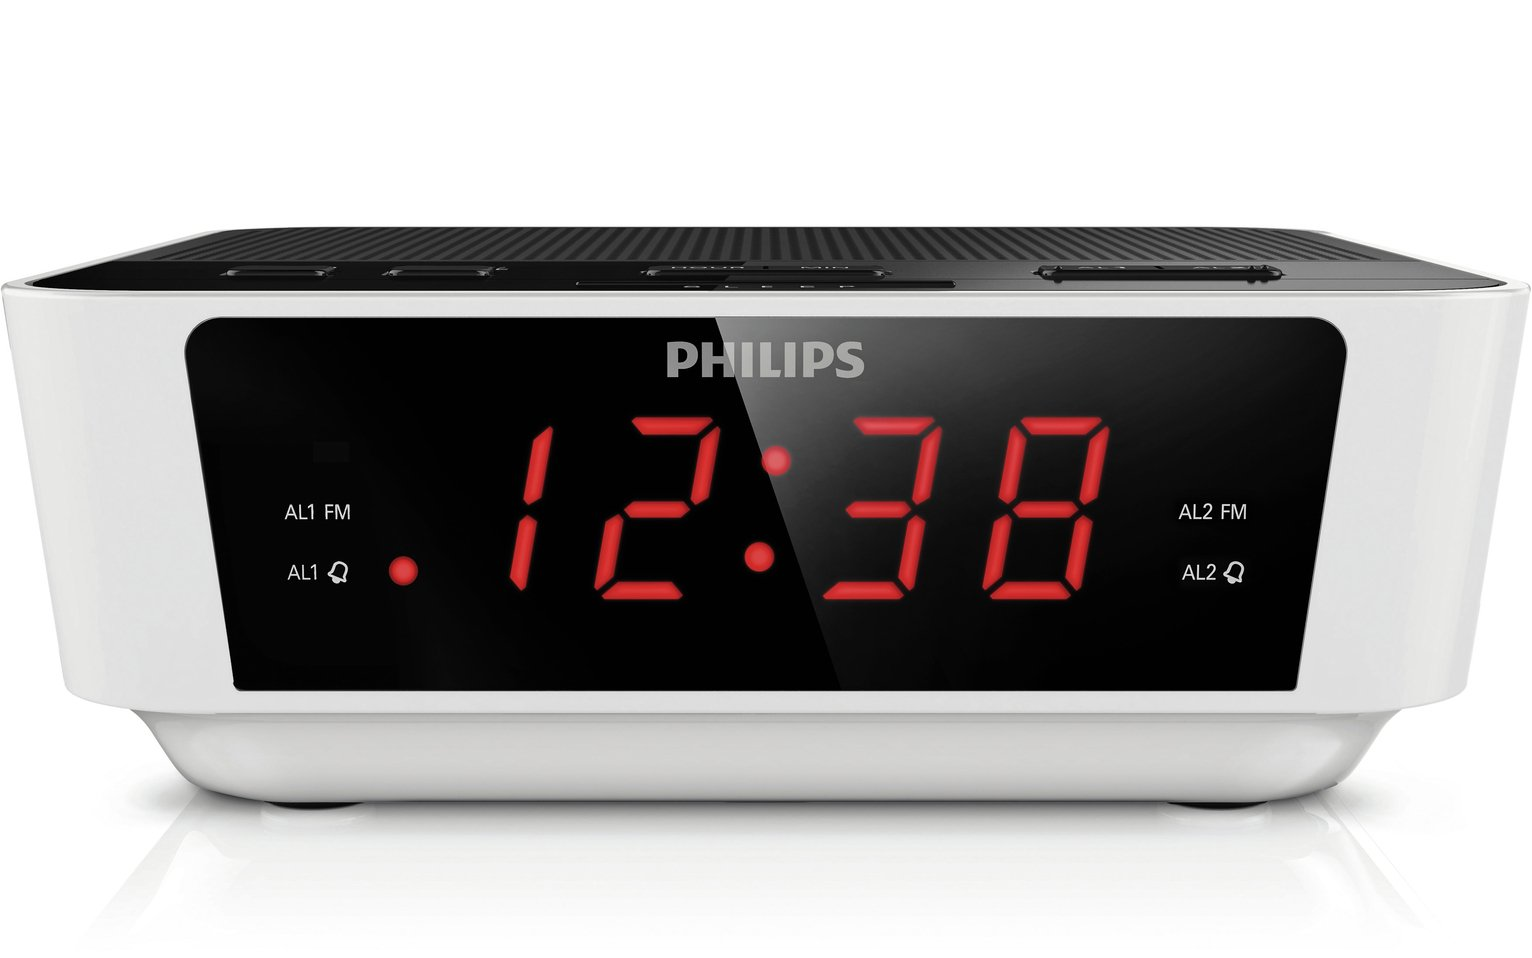 Philips AJ3115 FM Clock Radio - White